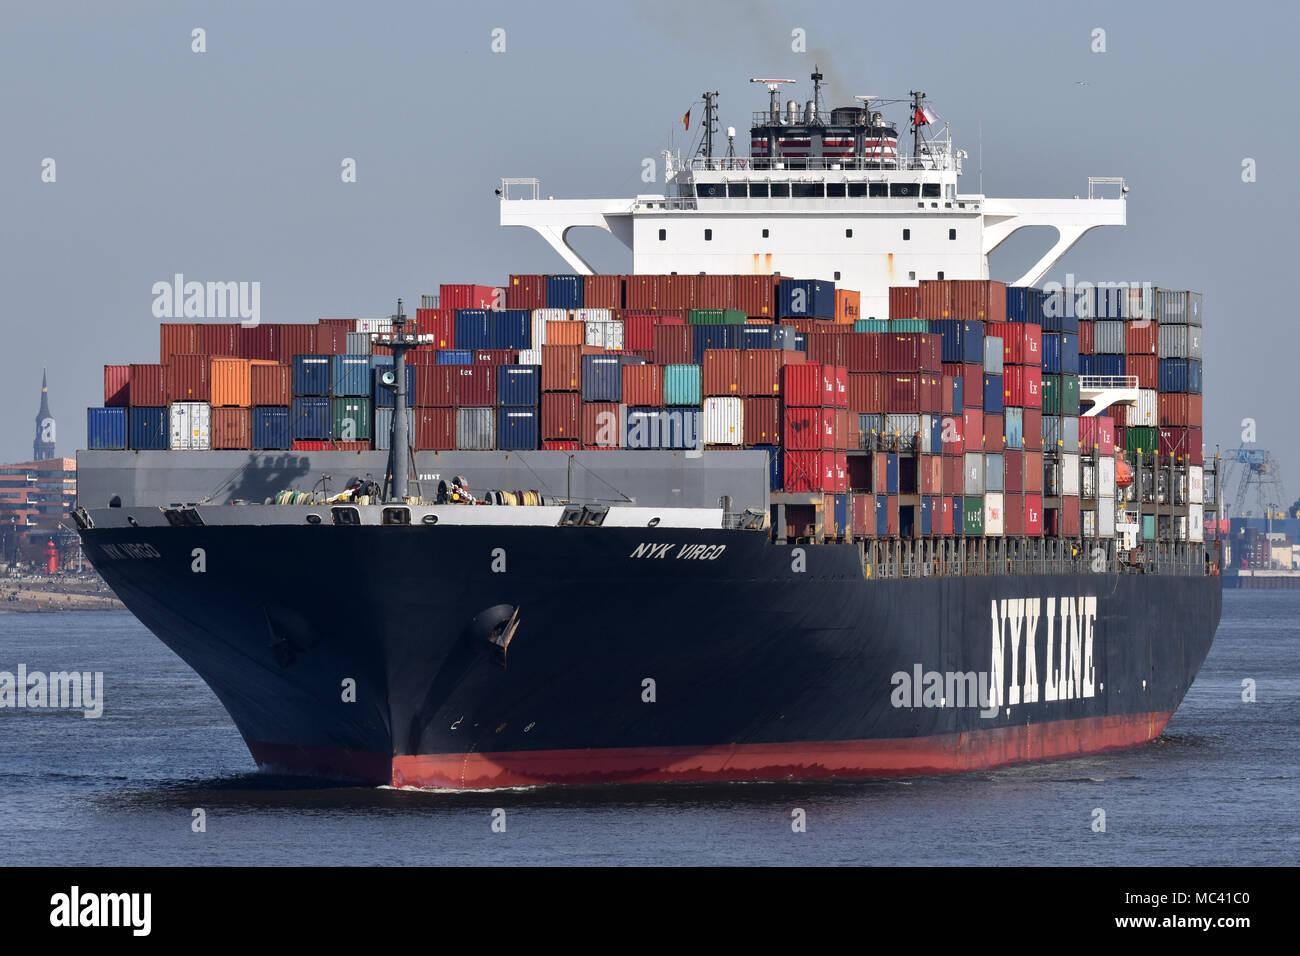 NYK Virgo leaving port of Hamburg - Stock Image